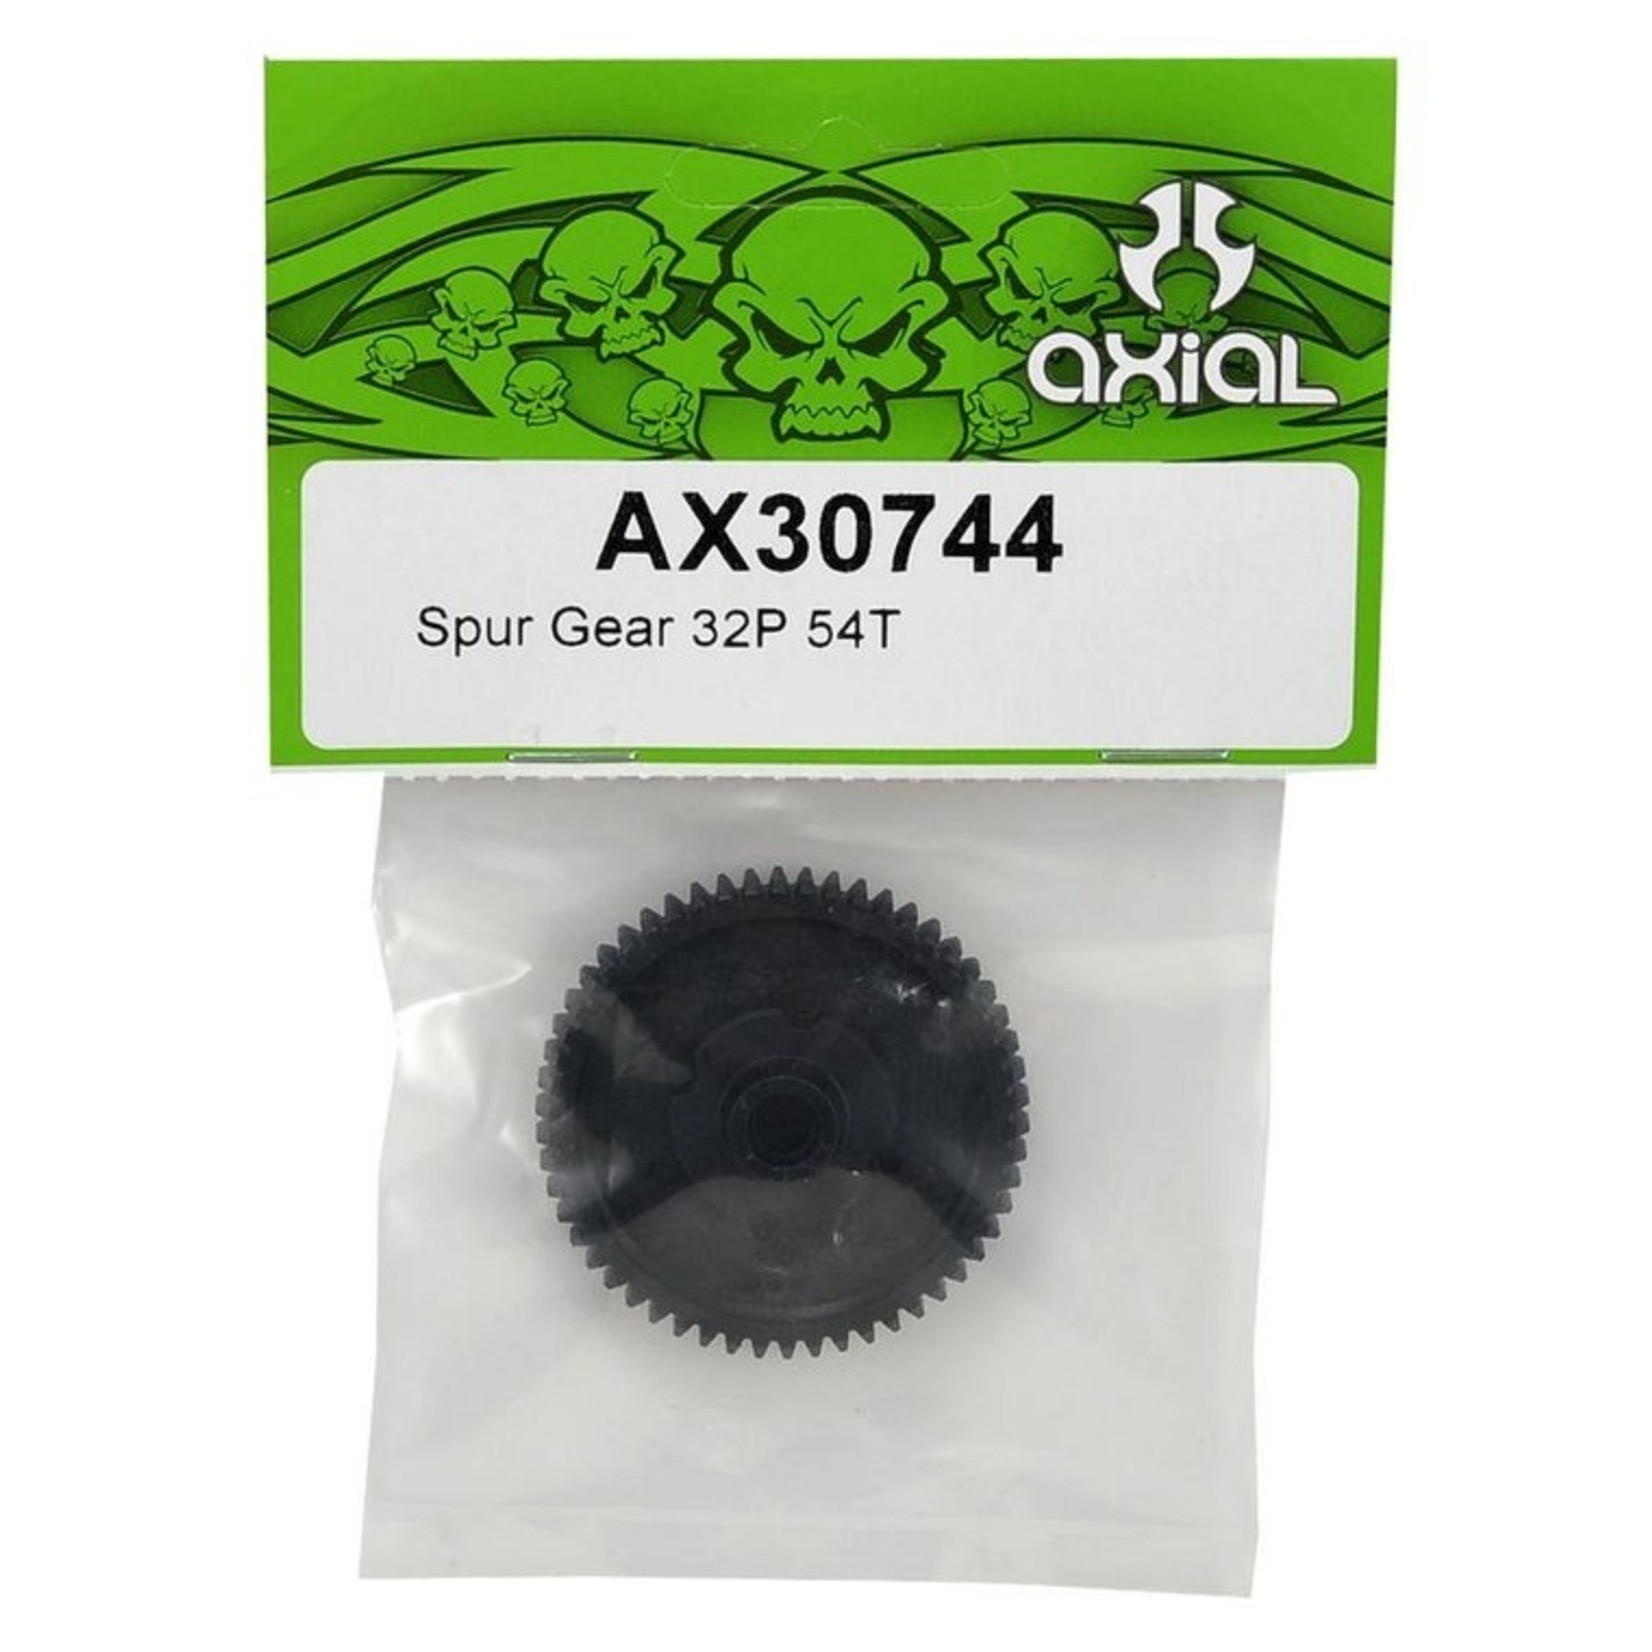 Axial AXI30744 Axial Spur Gear 32P 54T, EXO Yeti SCORE